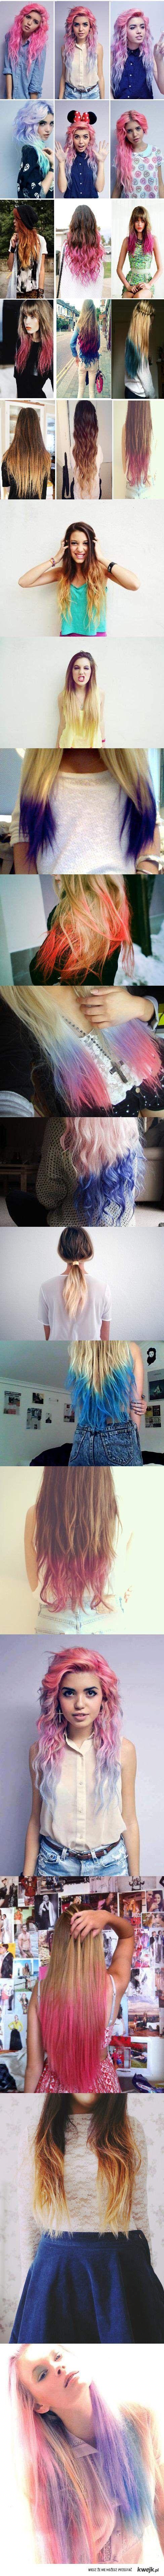 loveloveloveLong Hairstyles Ombre, Dyed Hair, Hair Colors, Dips Dyed, Dips Dyes, Ombre Hair, Colours Hair, Hair Style, Colors Hair